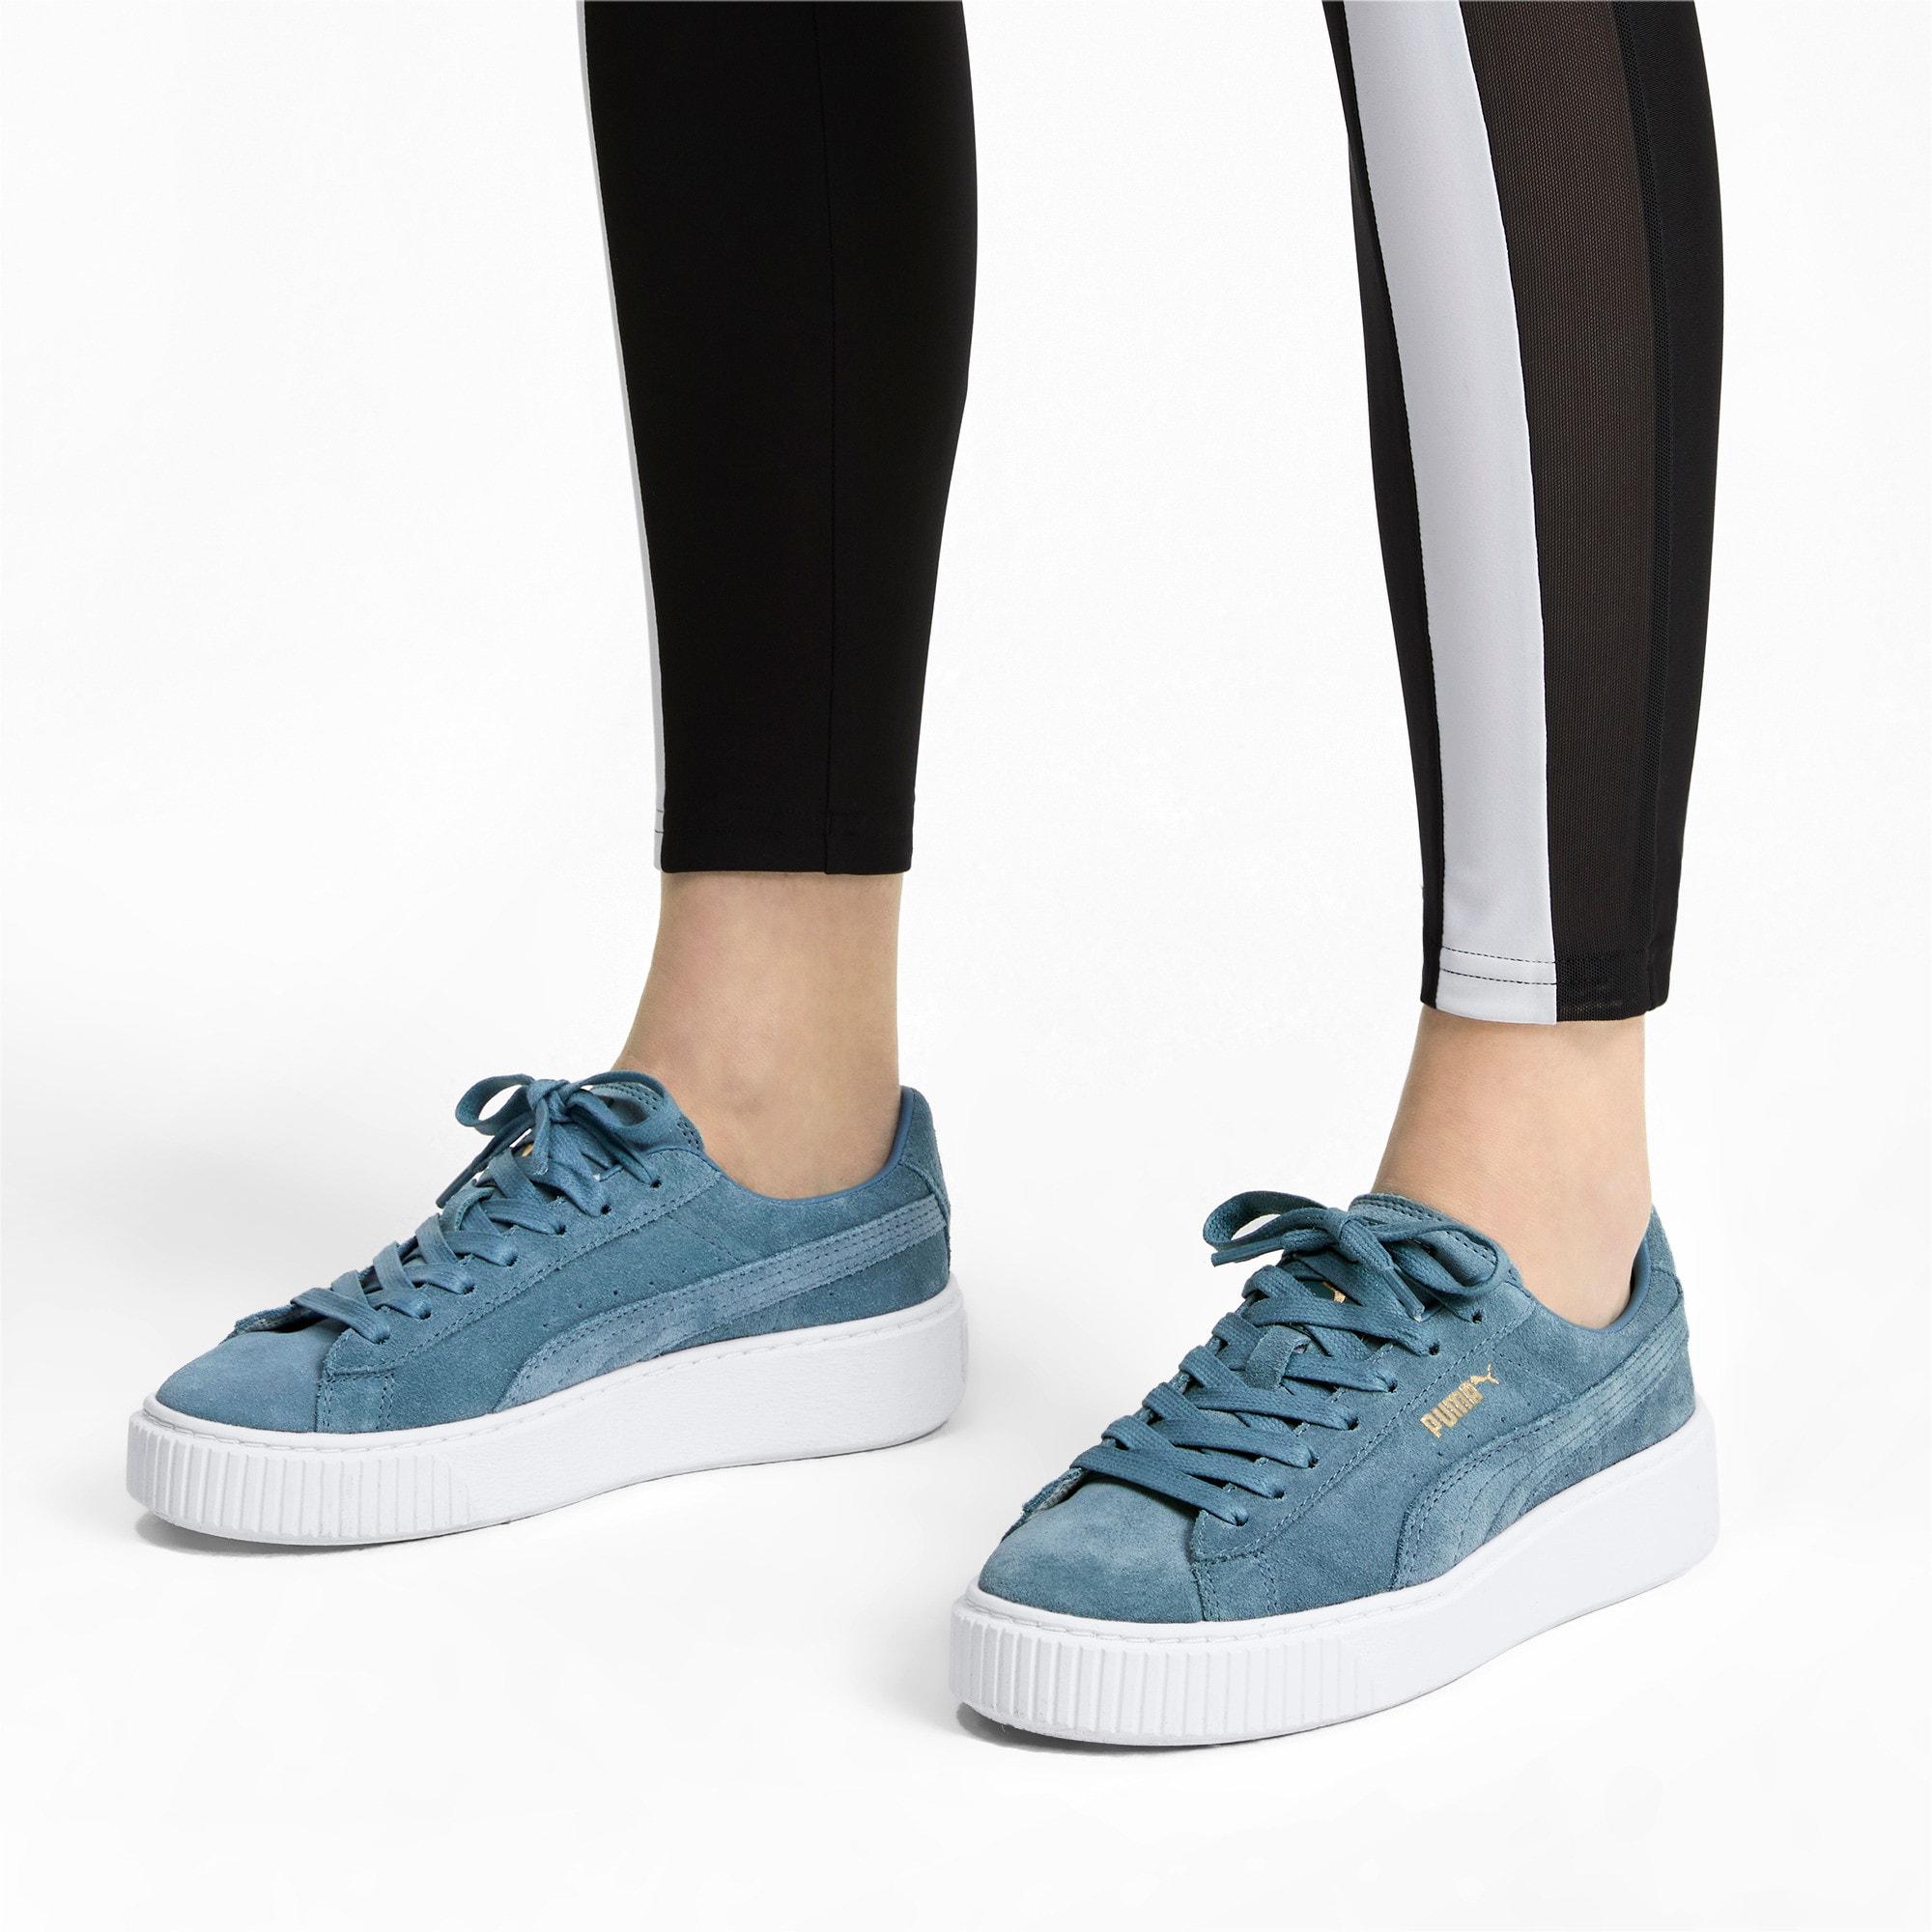 Thumbnail 3 of Suede Platform Women's Sneakers, Bluestone-Puma Team Gold, medium